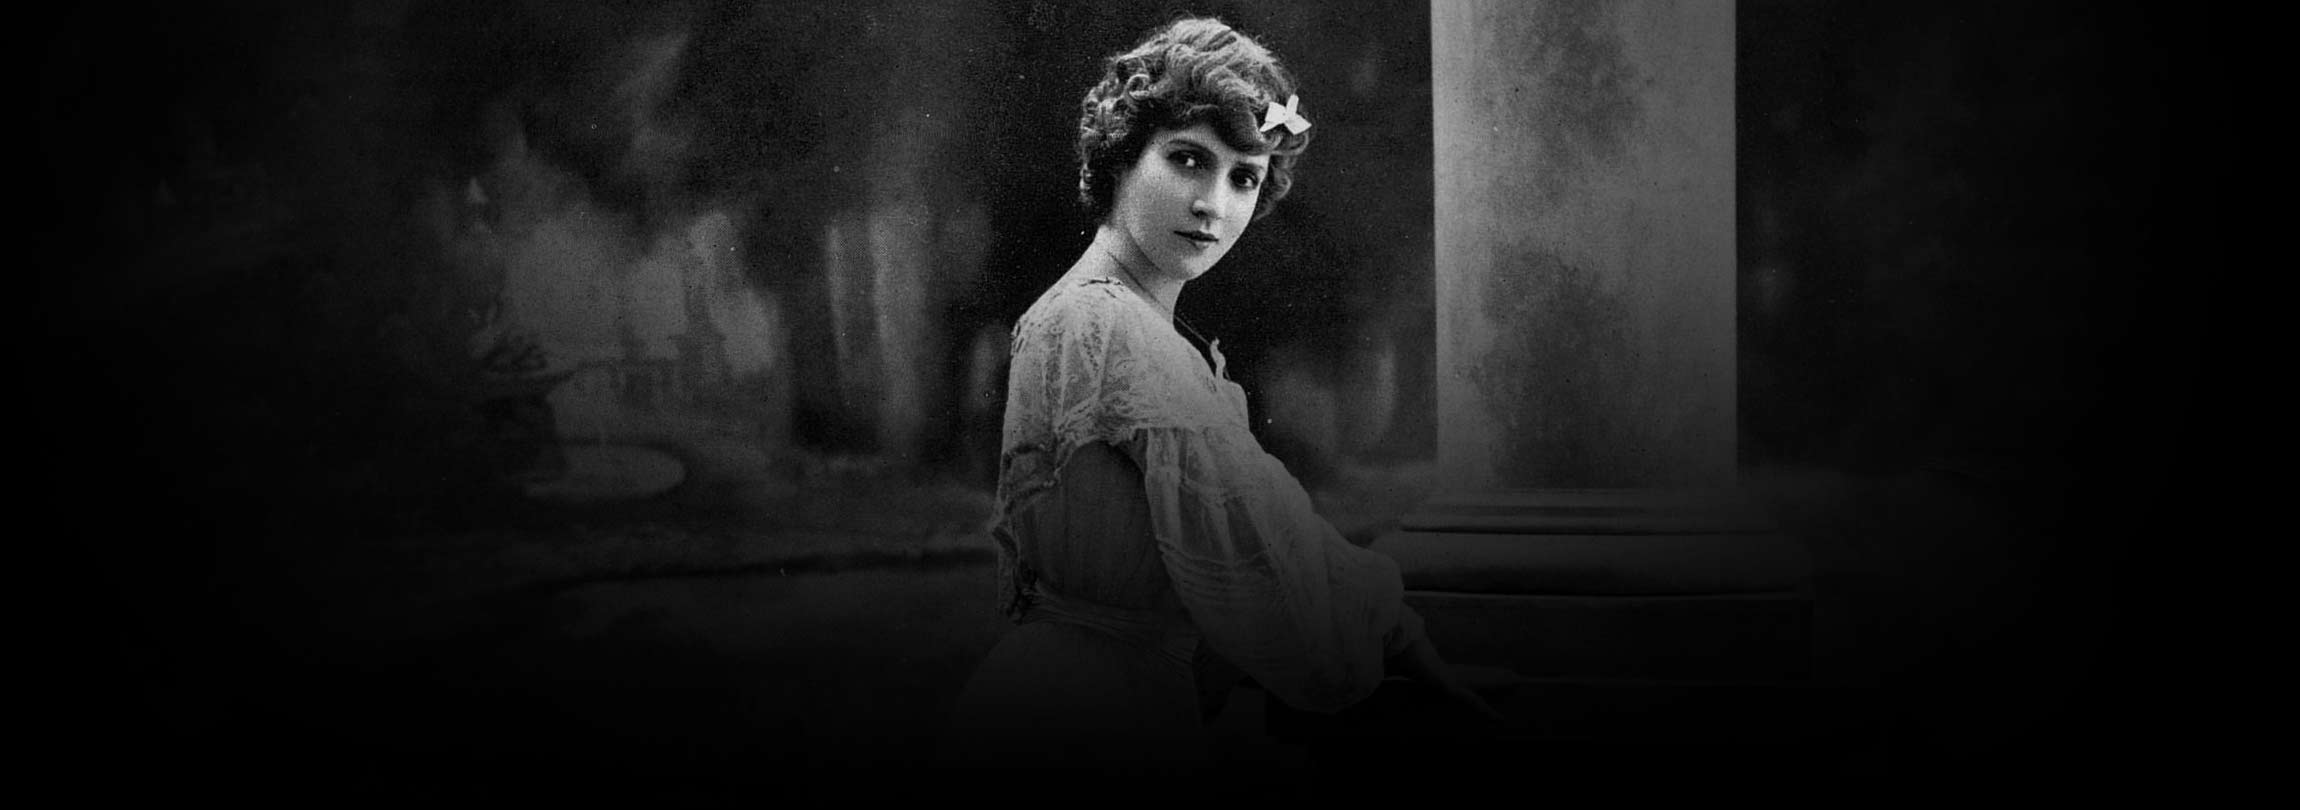 Ève Lavallière: uma Madalena moderna